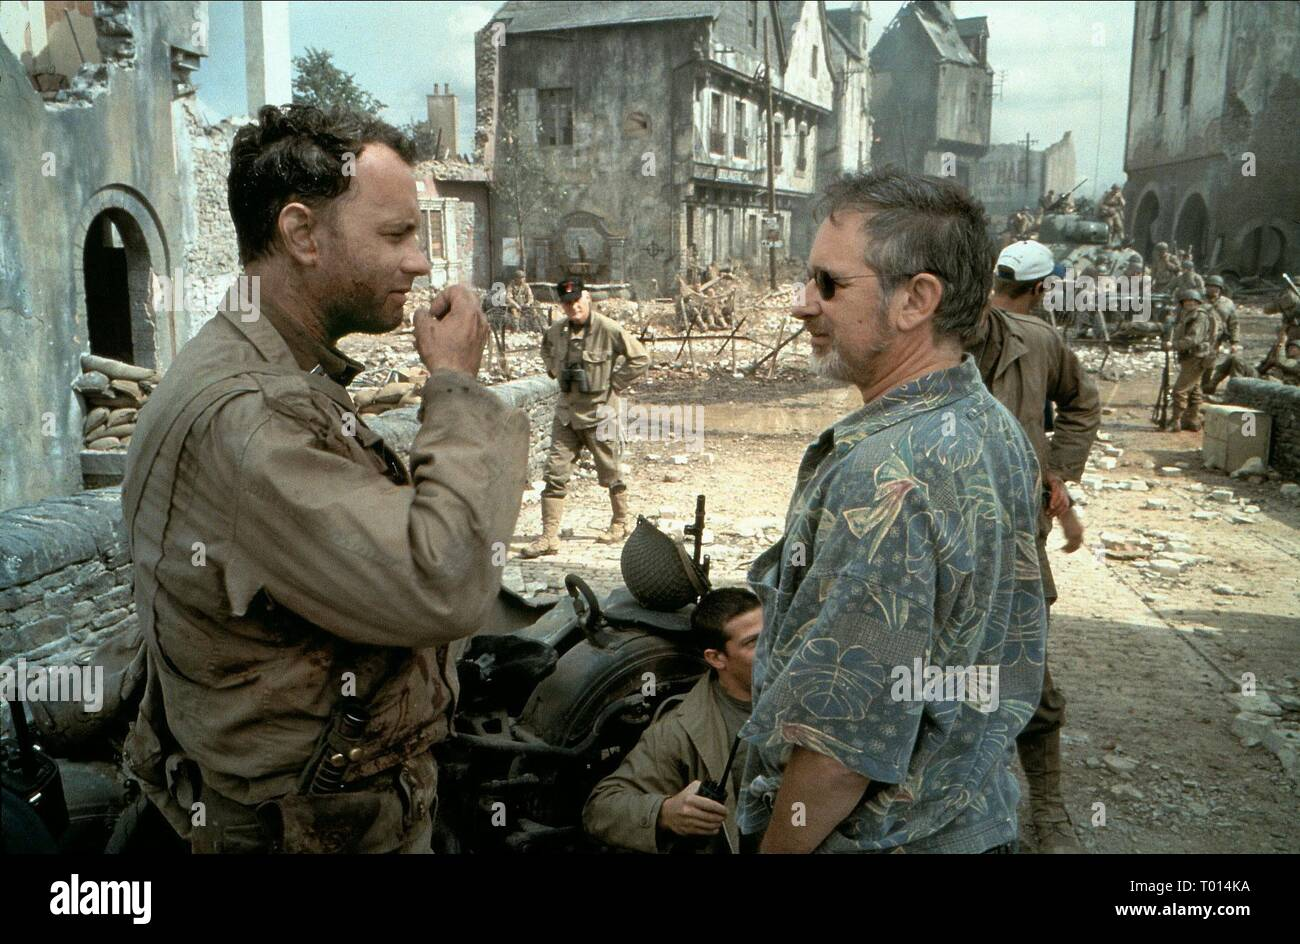 Tom Hanks Steven Spielberg Saving Private Ryan 1998 Stock Photo Alamy